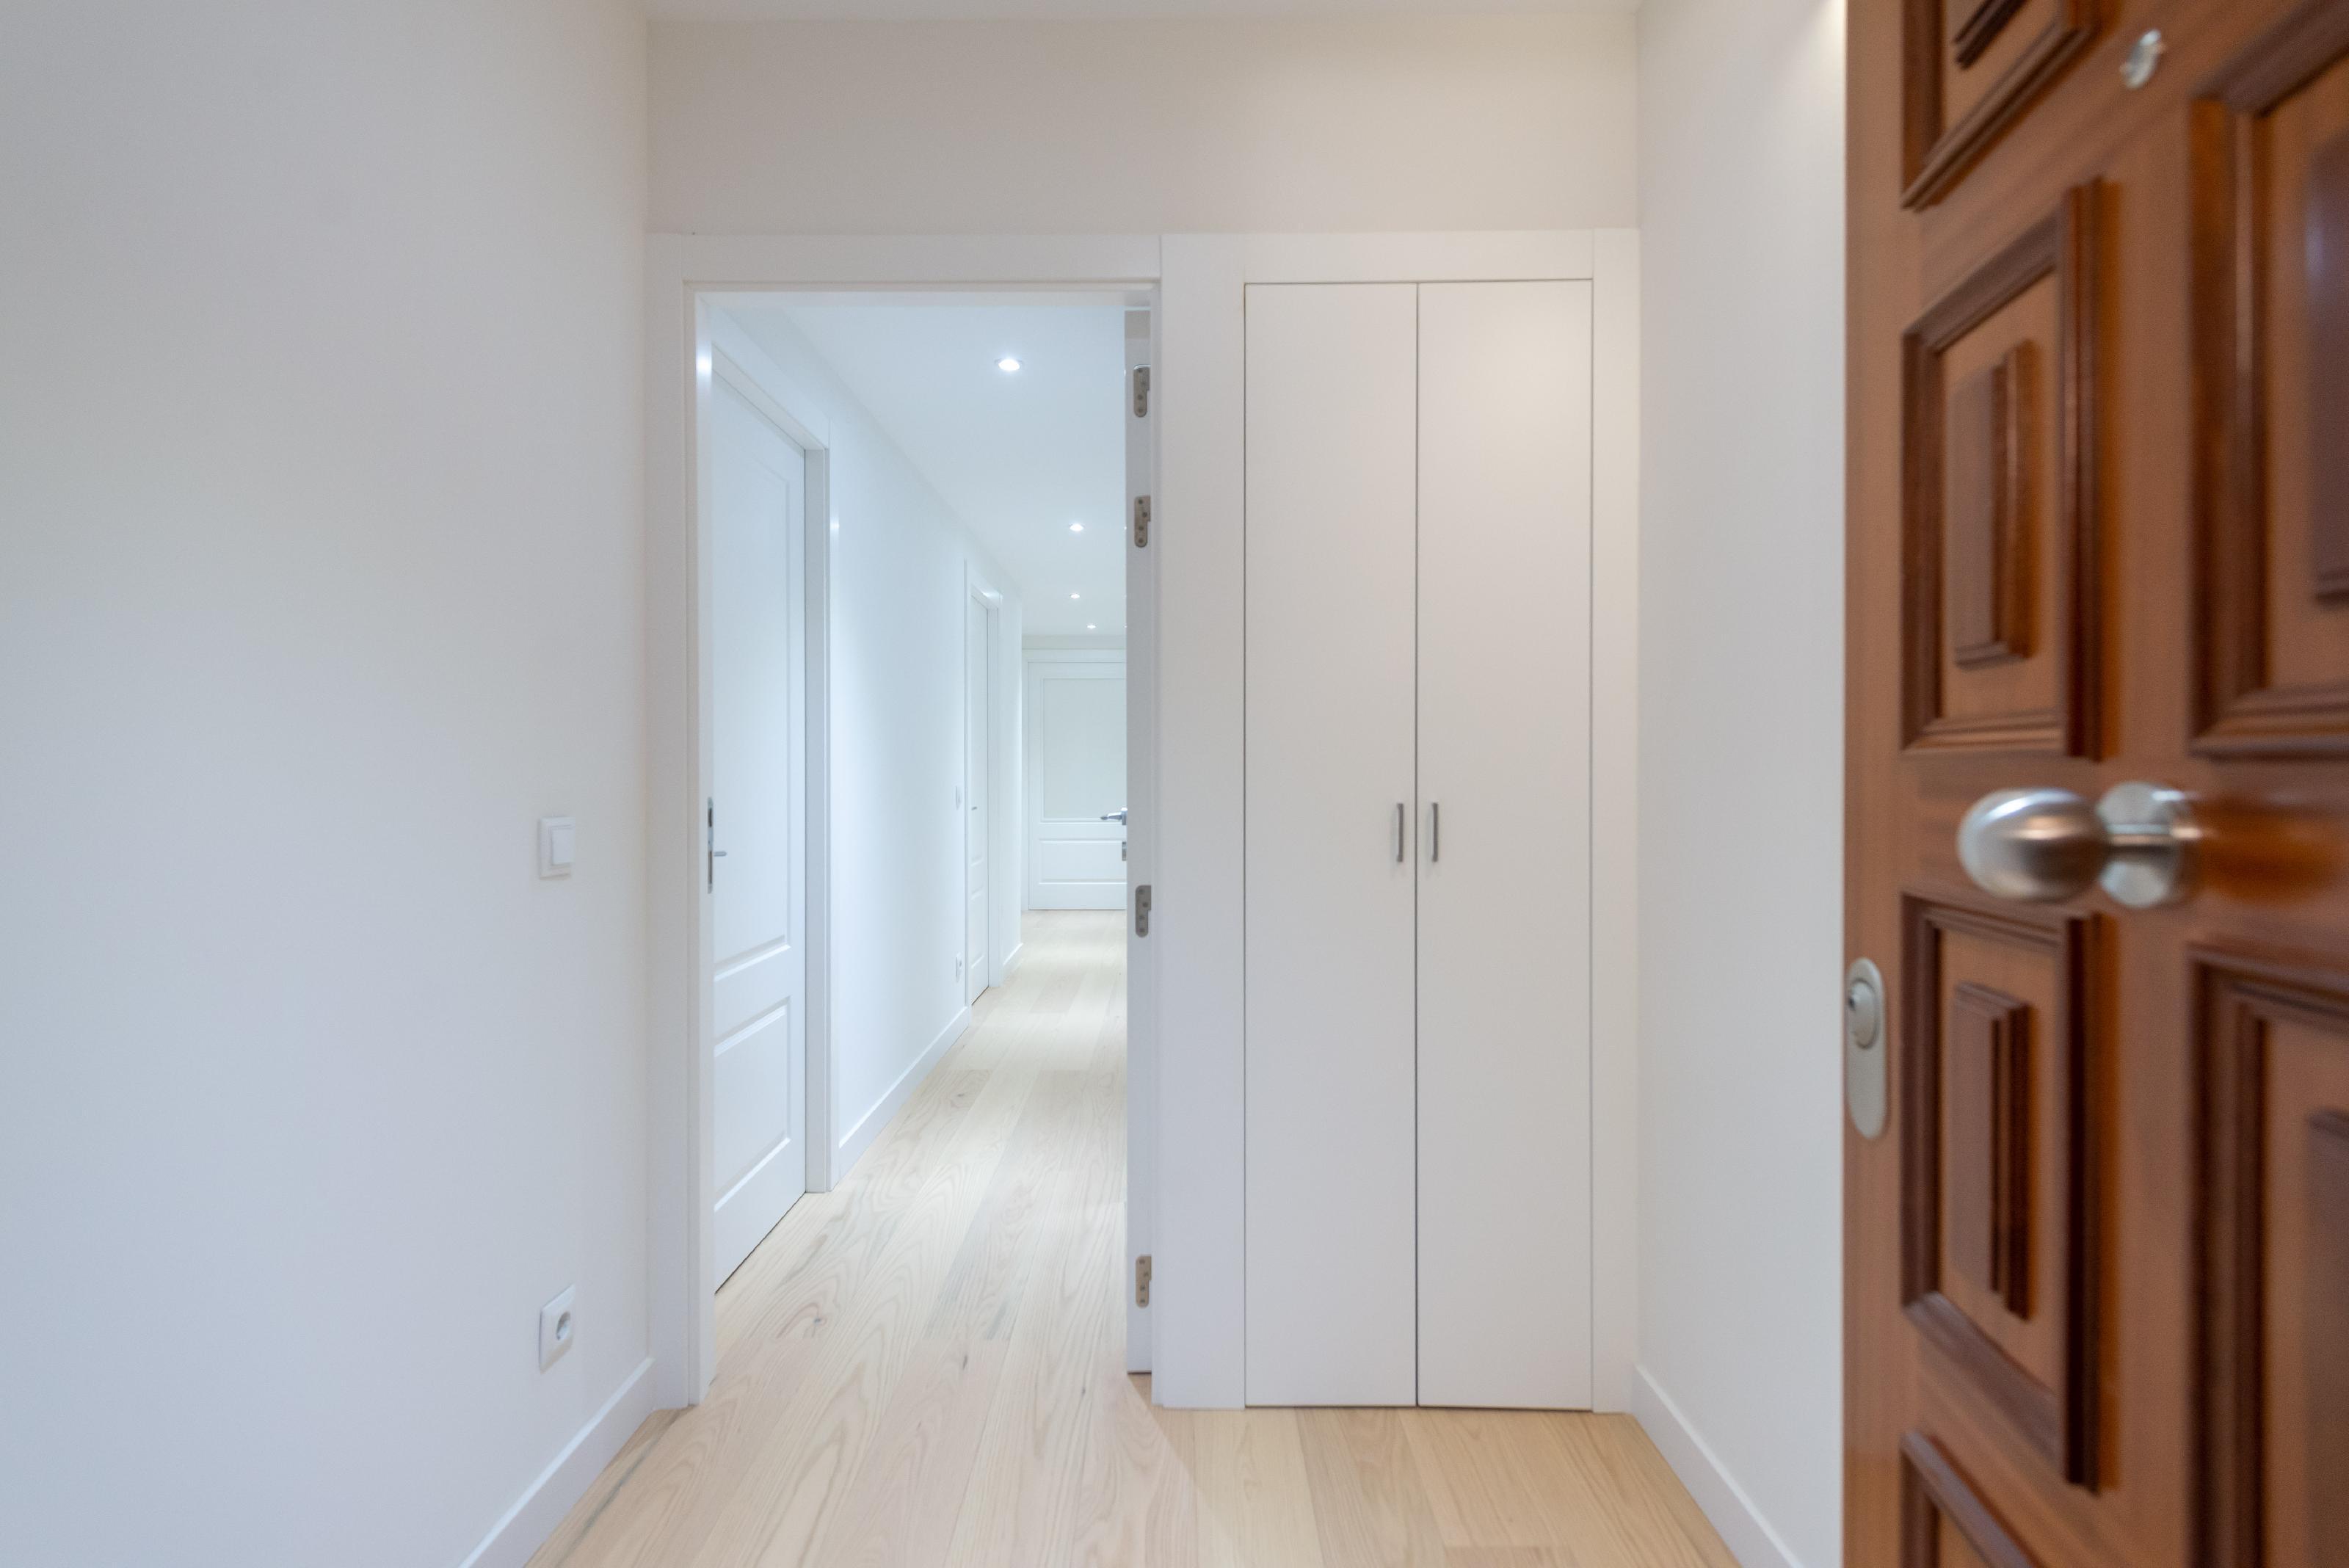 245231 Flat for sale in Sarrià-Sant Gervasi, Sant Gervasi-Galvany 10